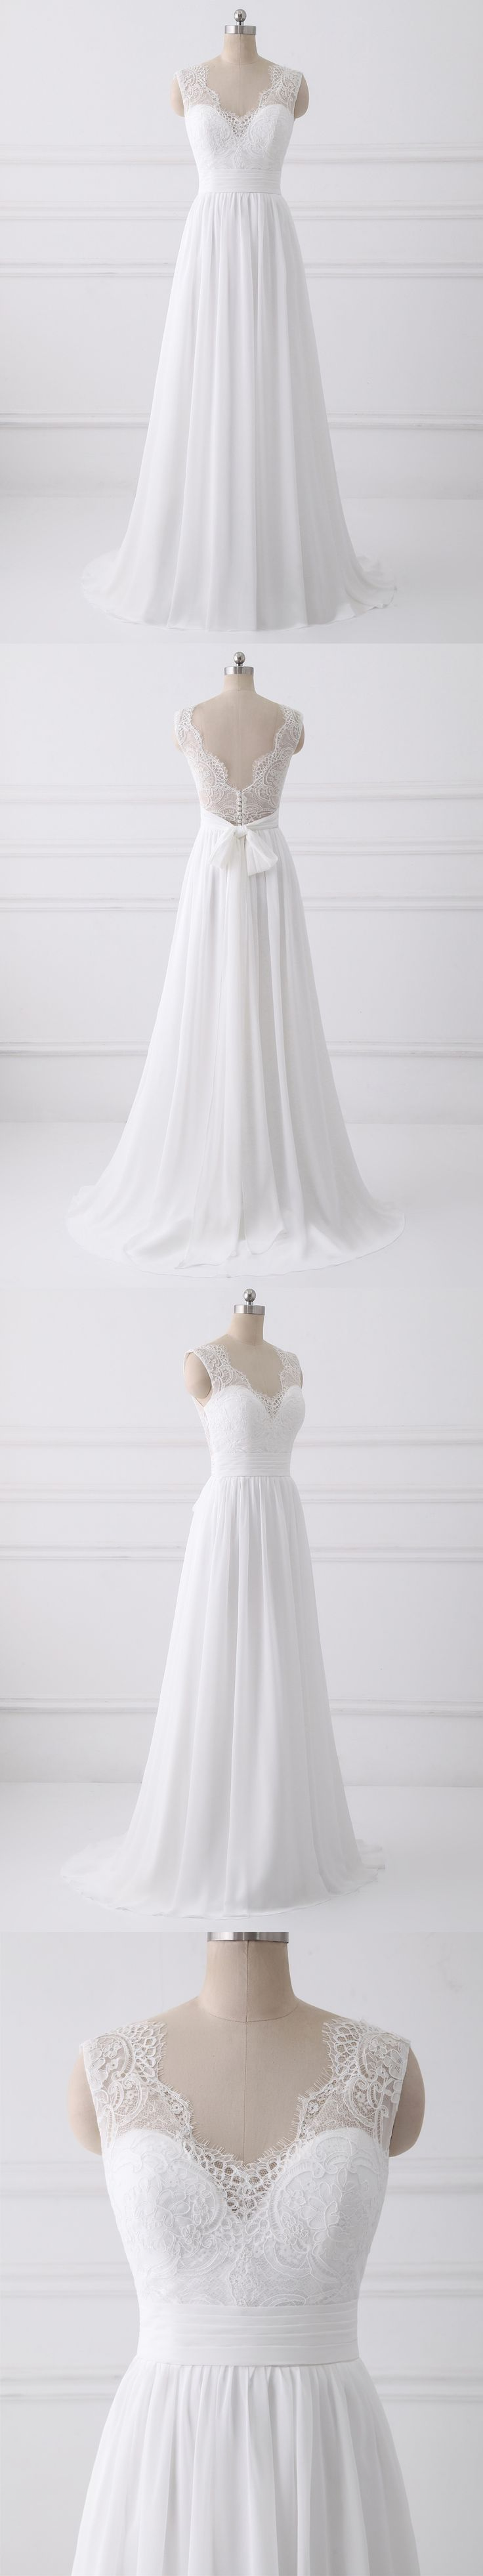 Chiffon lace beach wedding dress for summer wedding party,bridal dresses,wedding gown #sheergirl